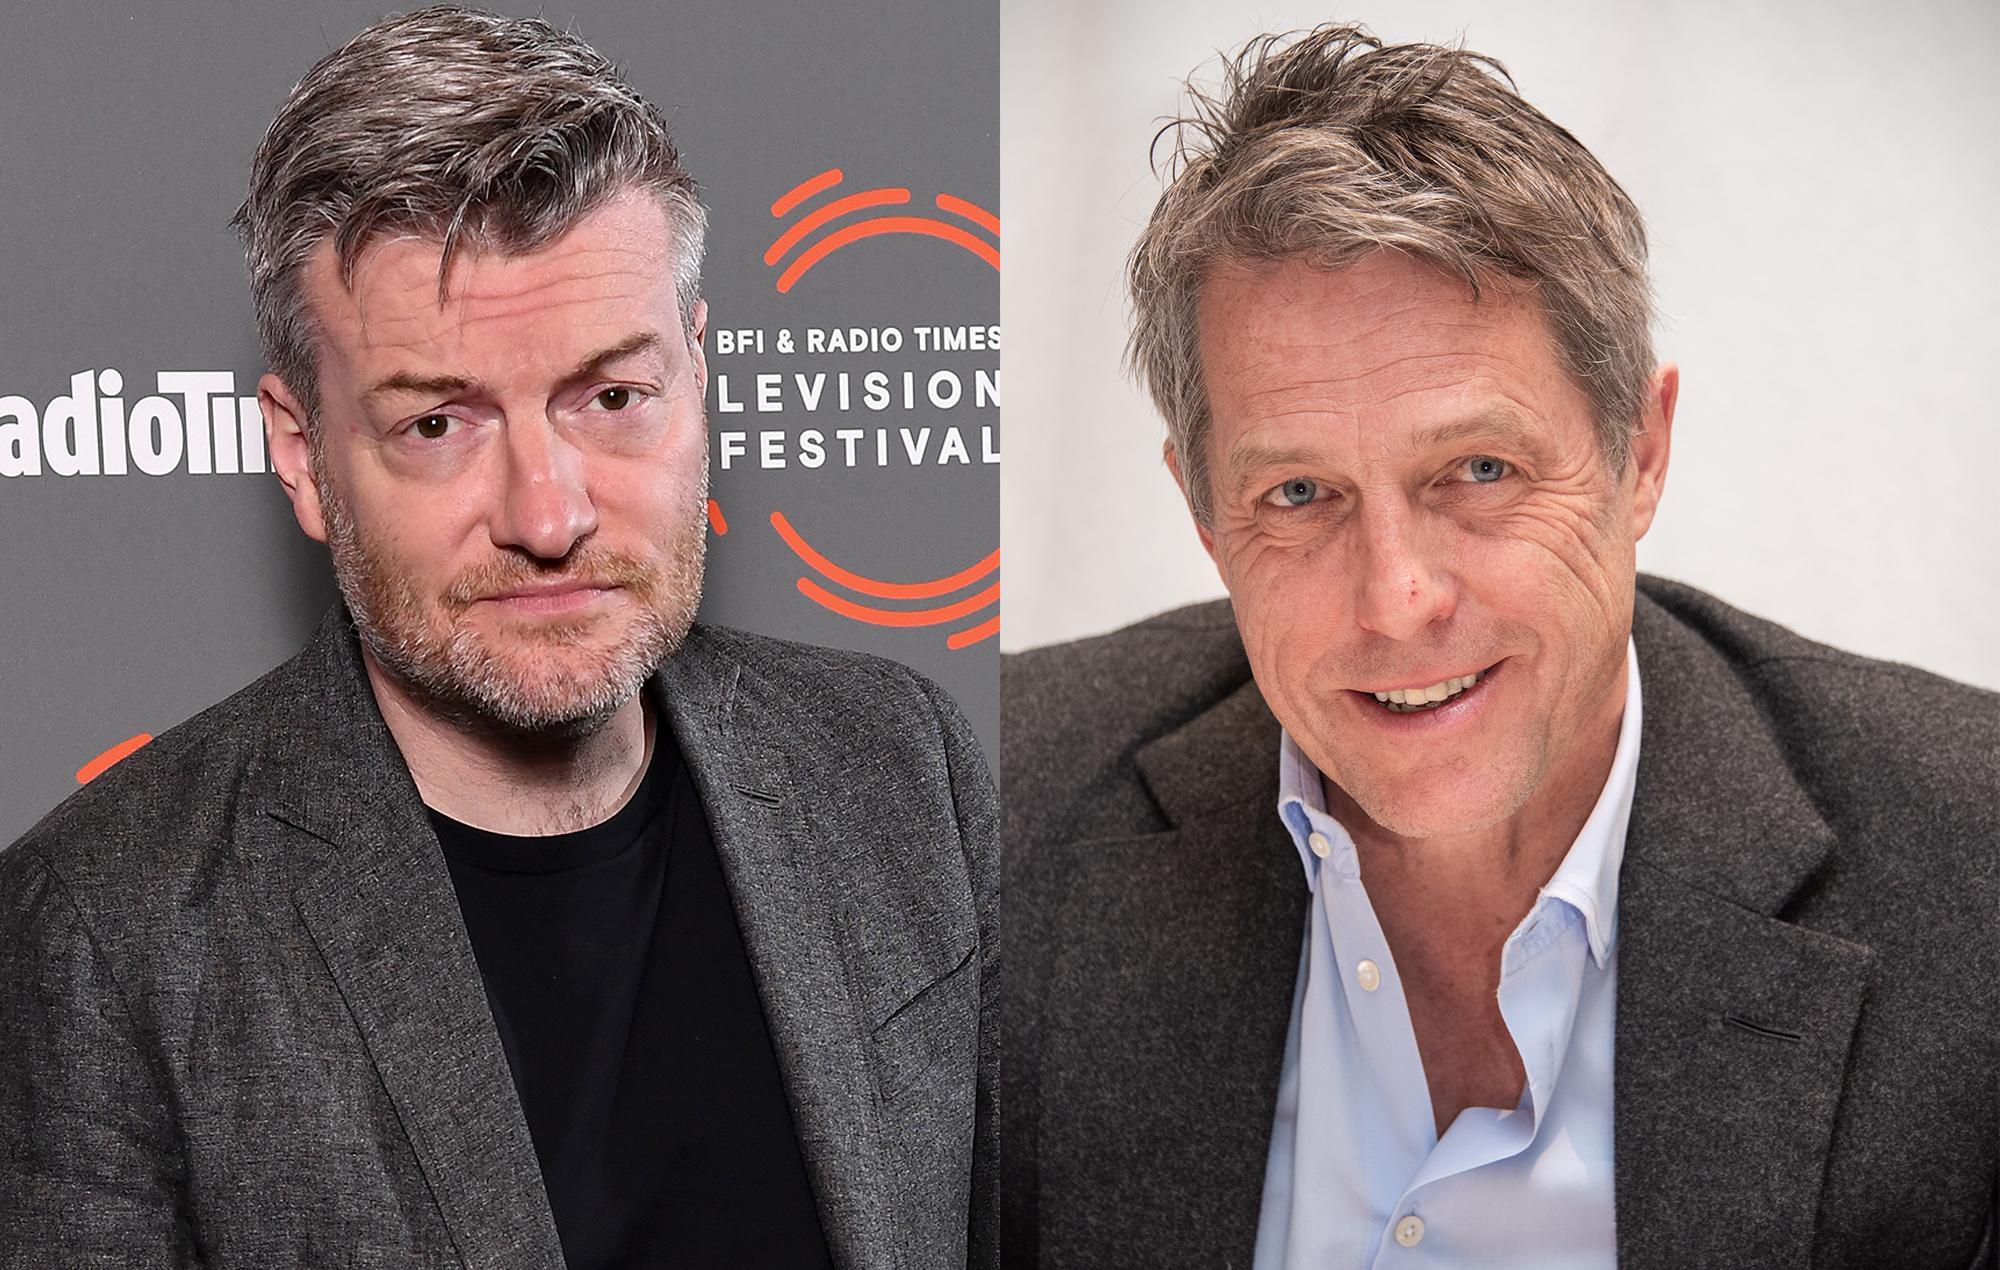 Charlie Brooker and Hugh Grant making Netflix mocukmentary about 2020